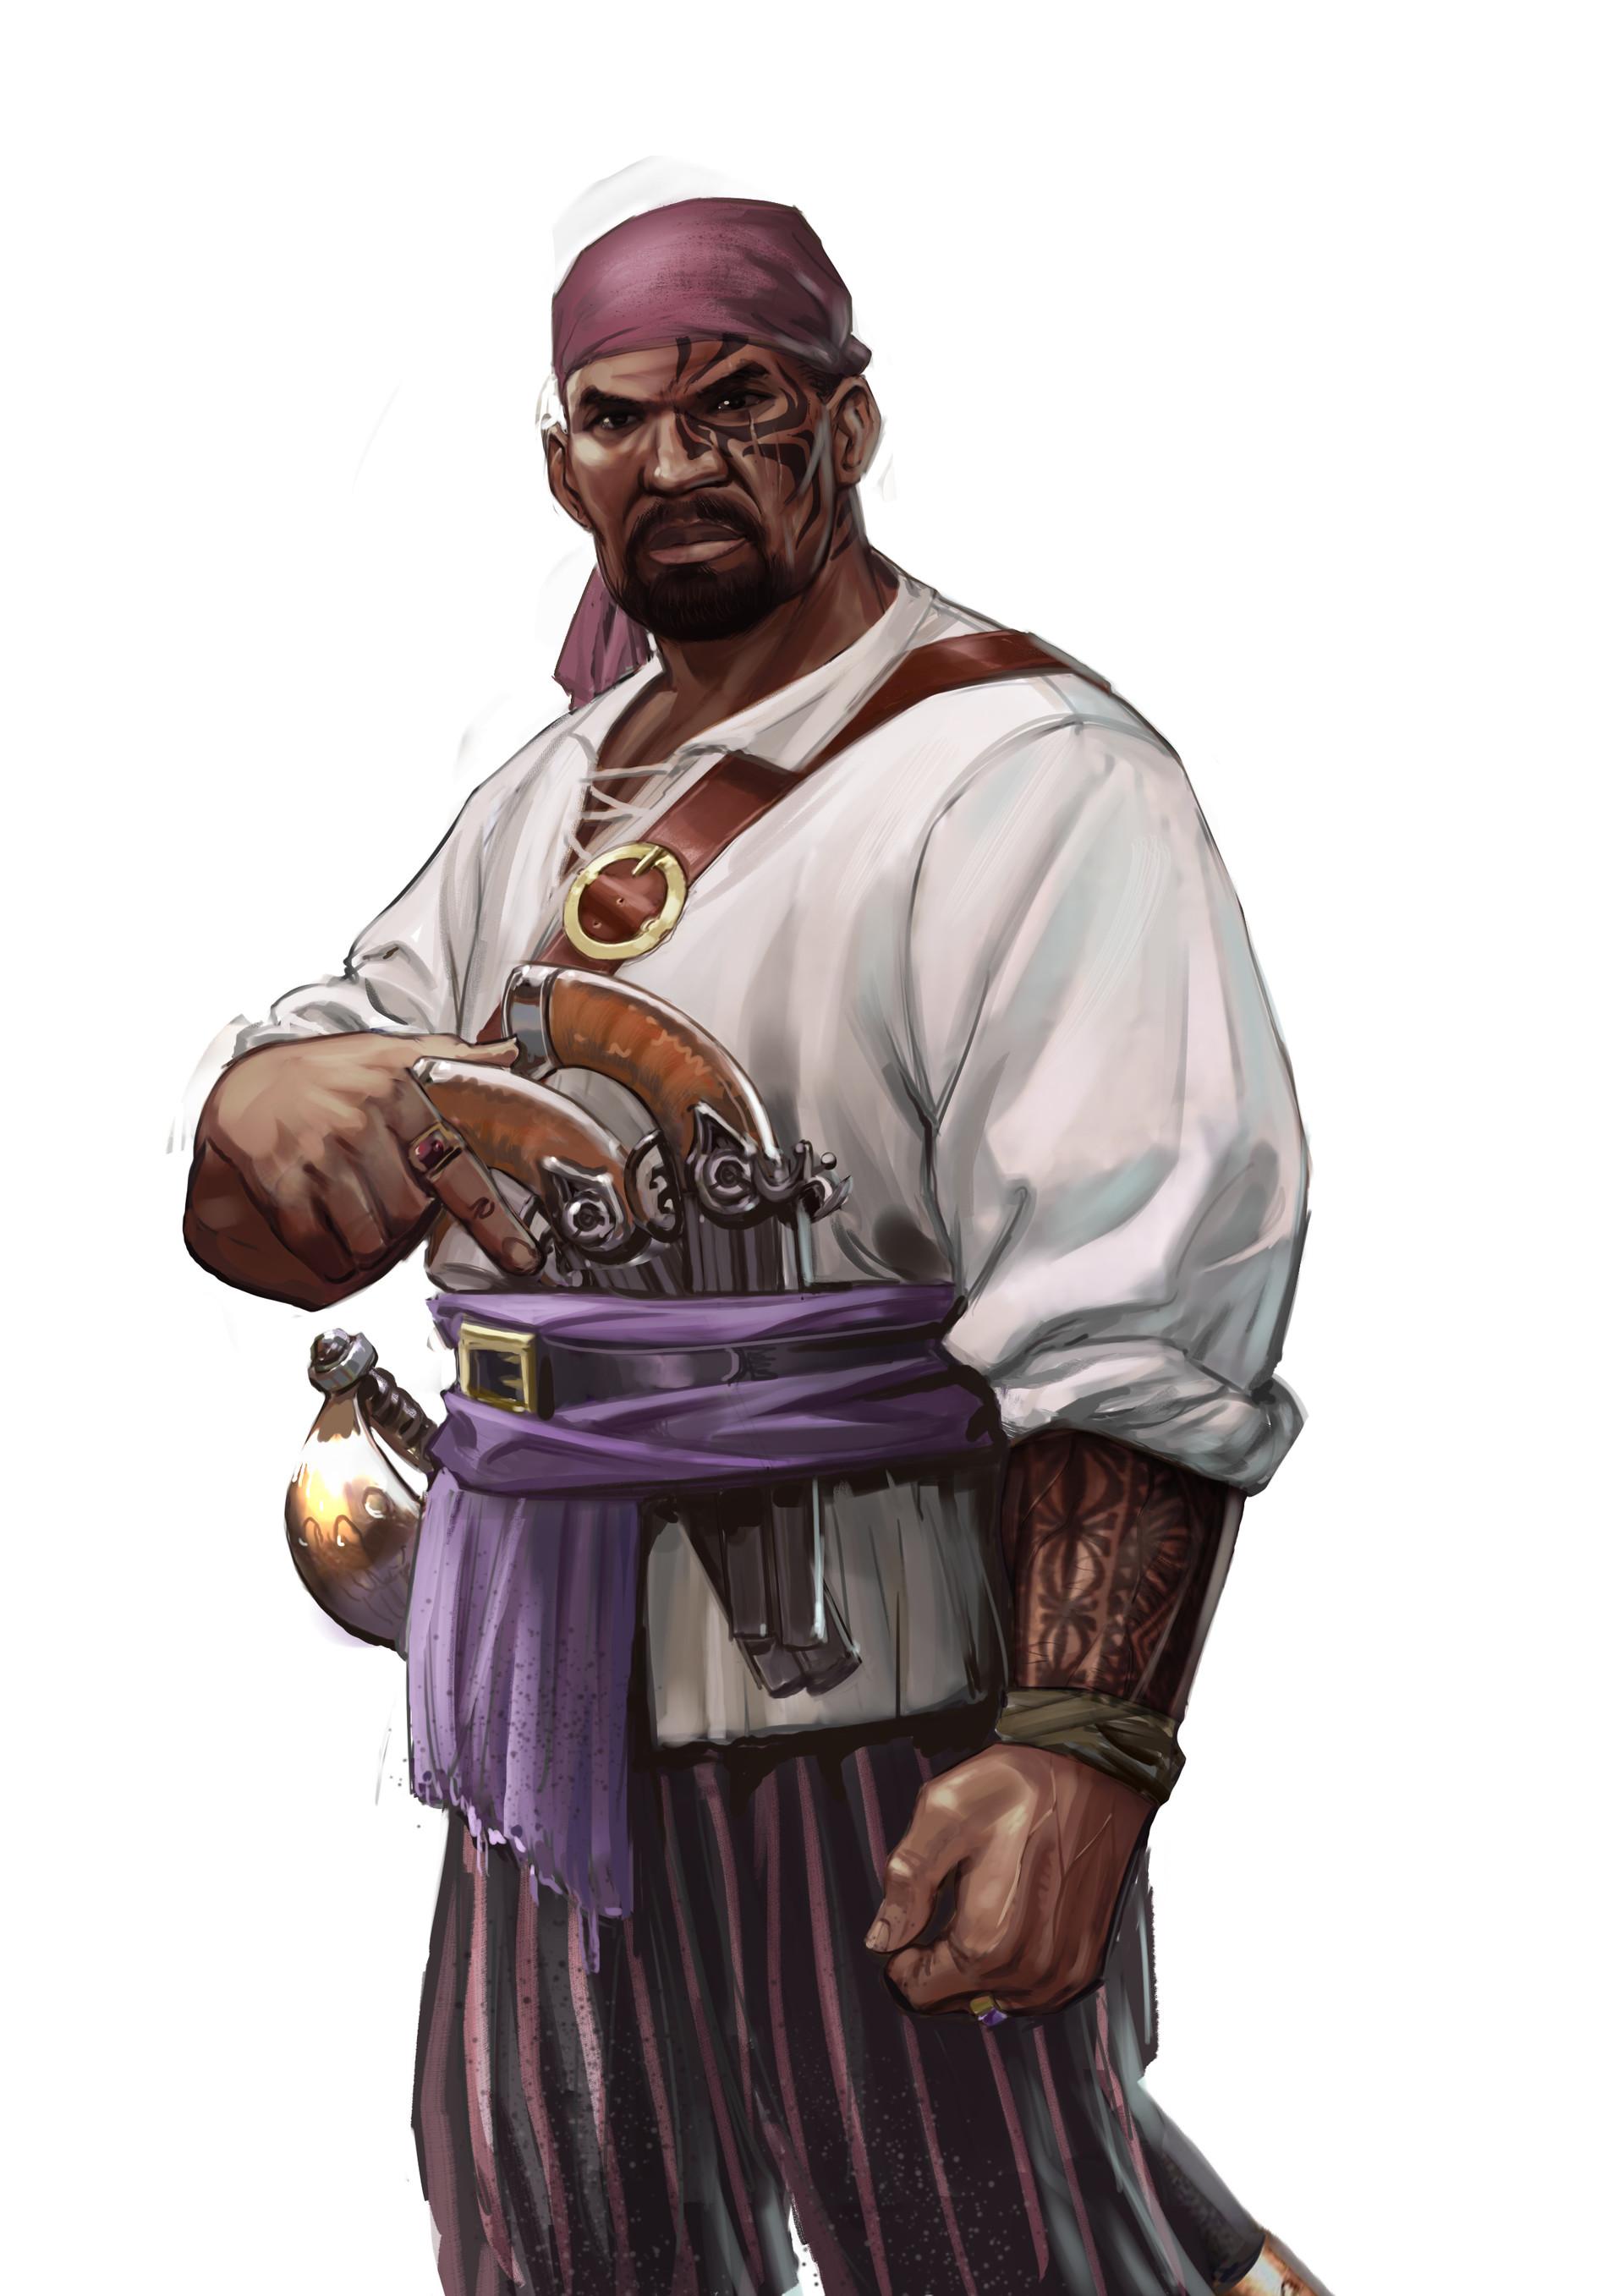 Pierre santamaria pirate black 04 white